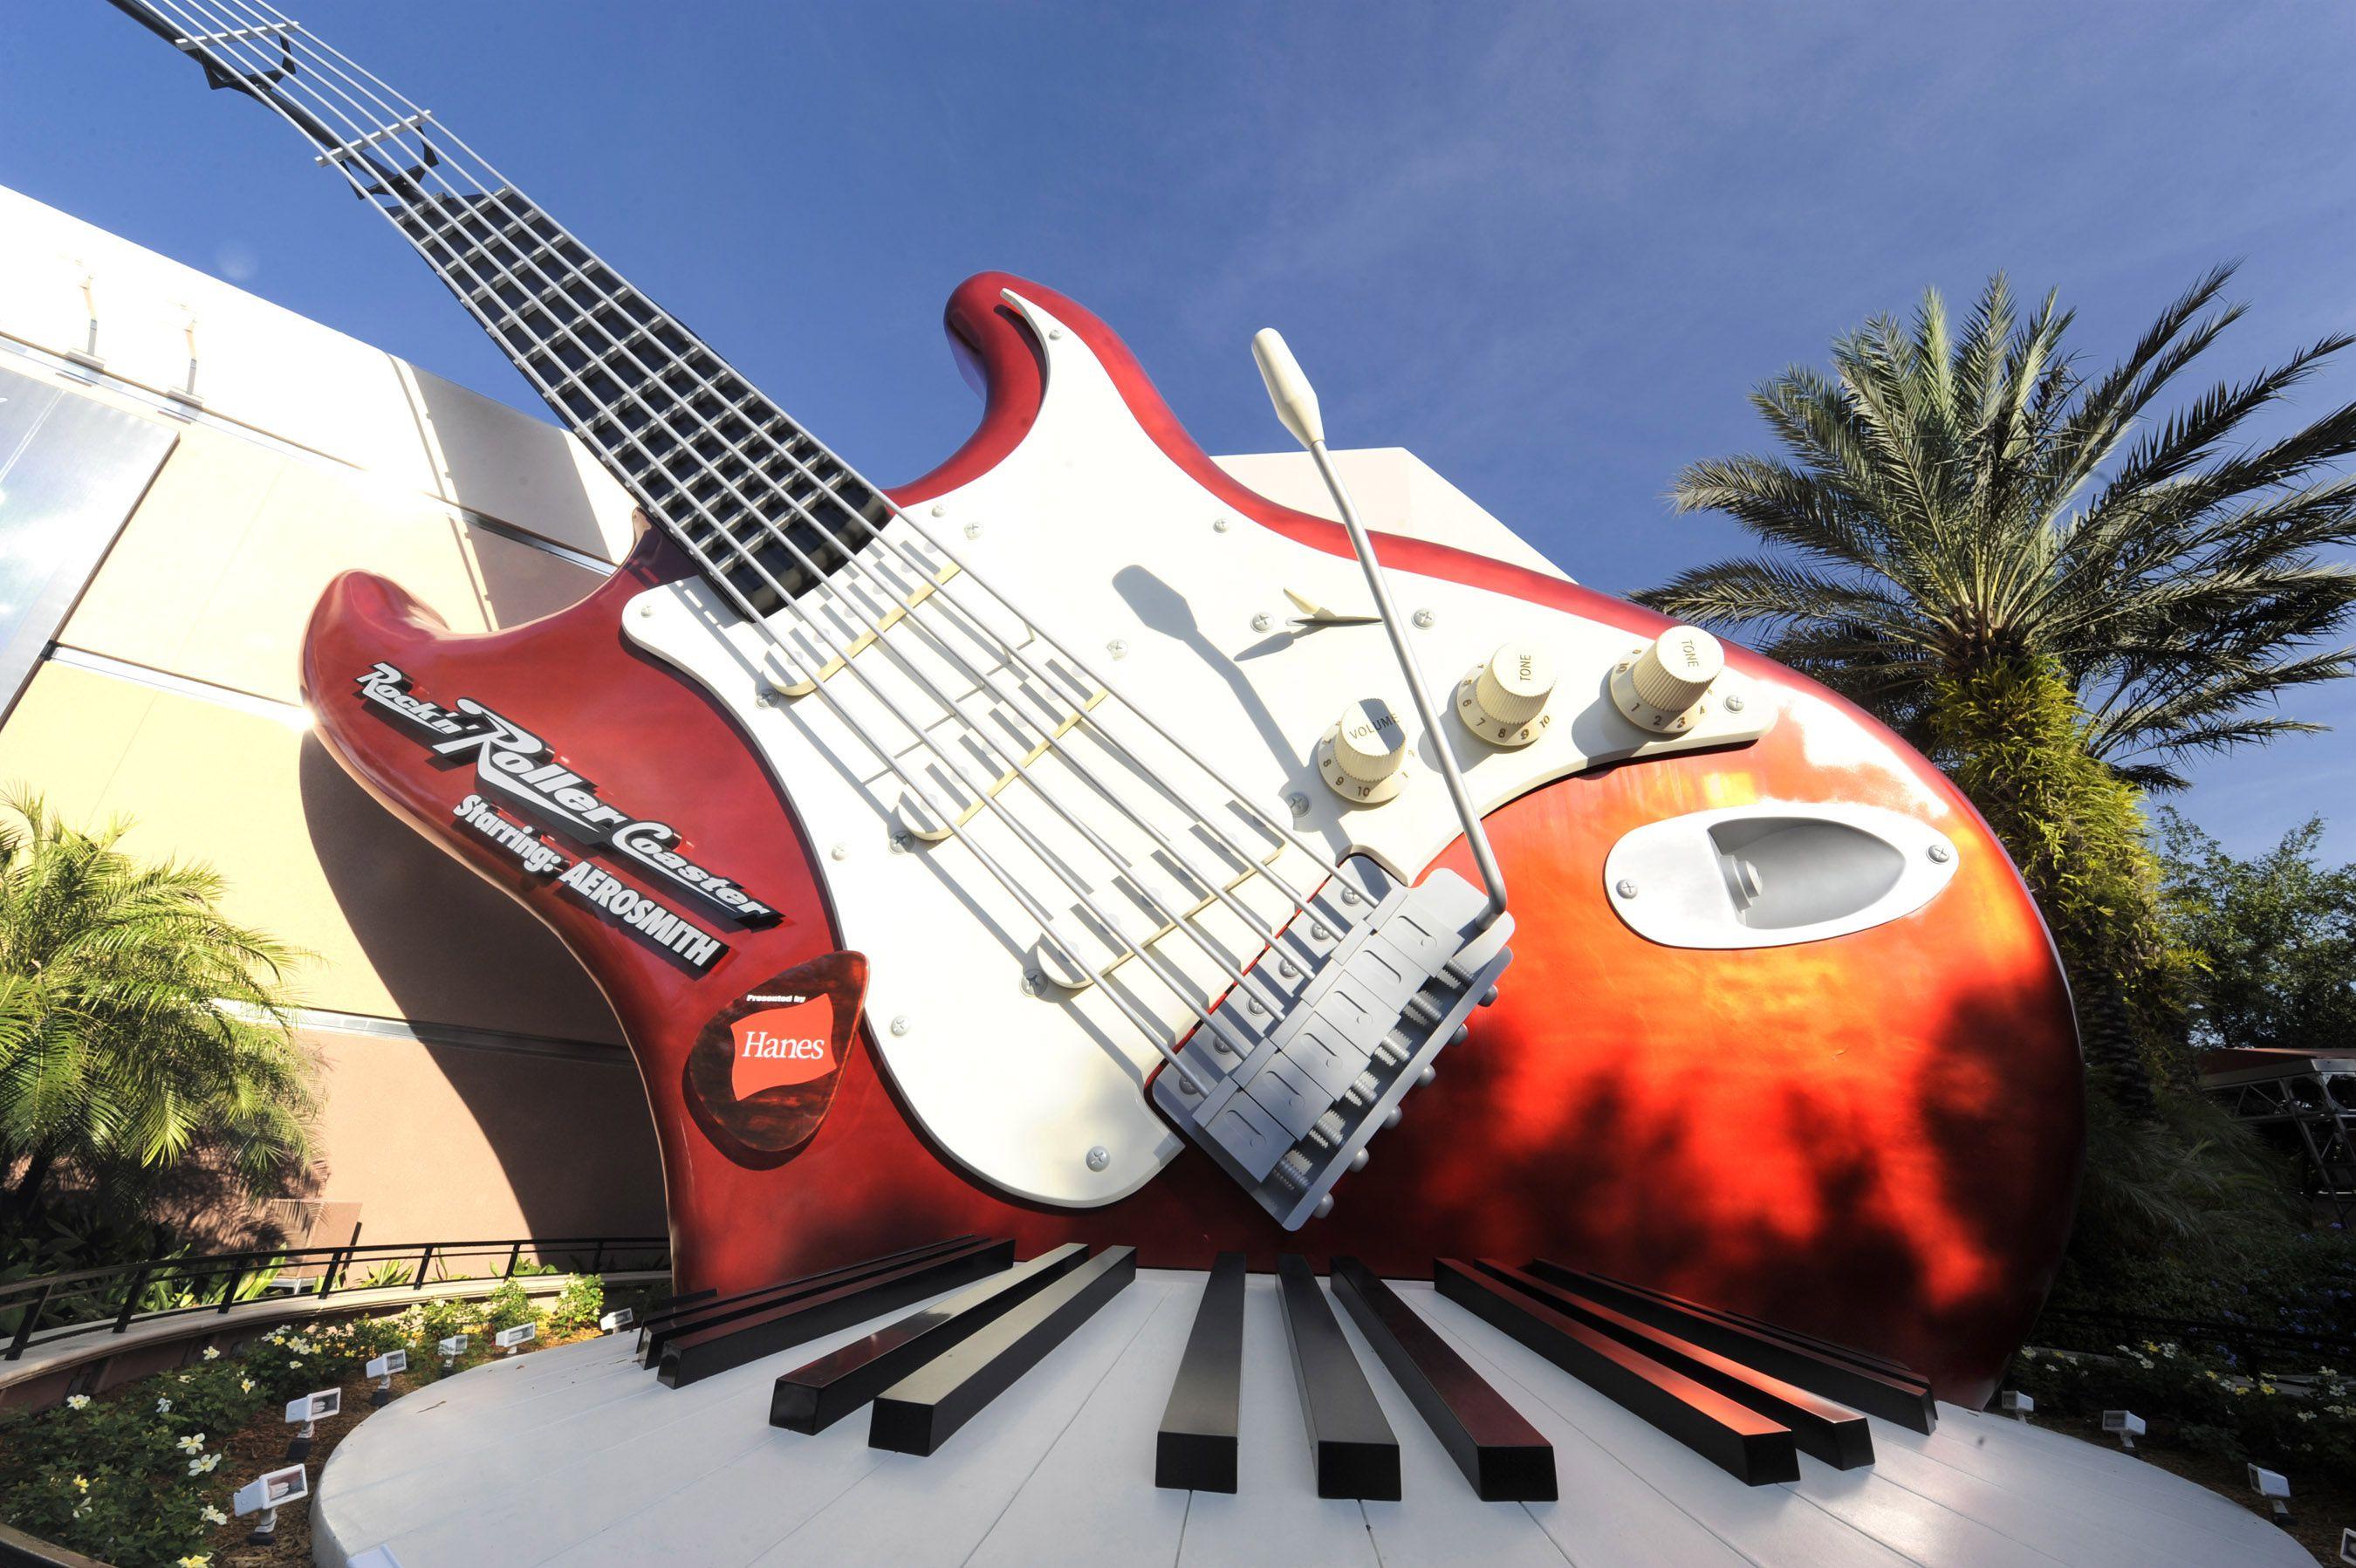 The Rock 'n' Roller Coaster Starring Aerosmith, entrance